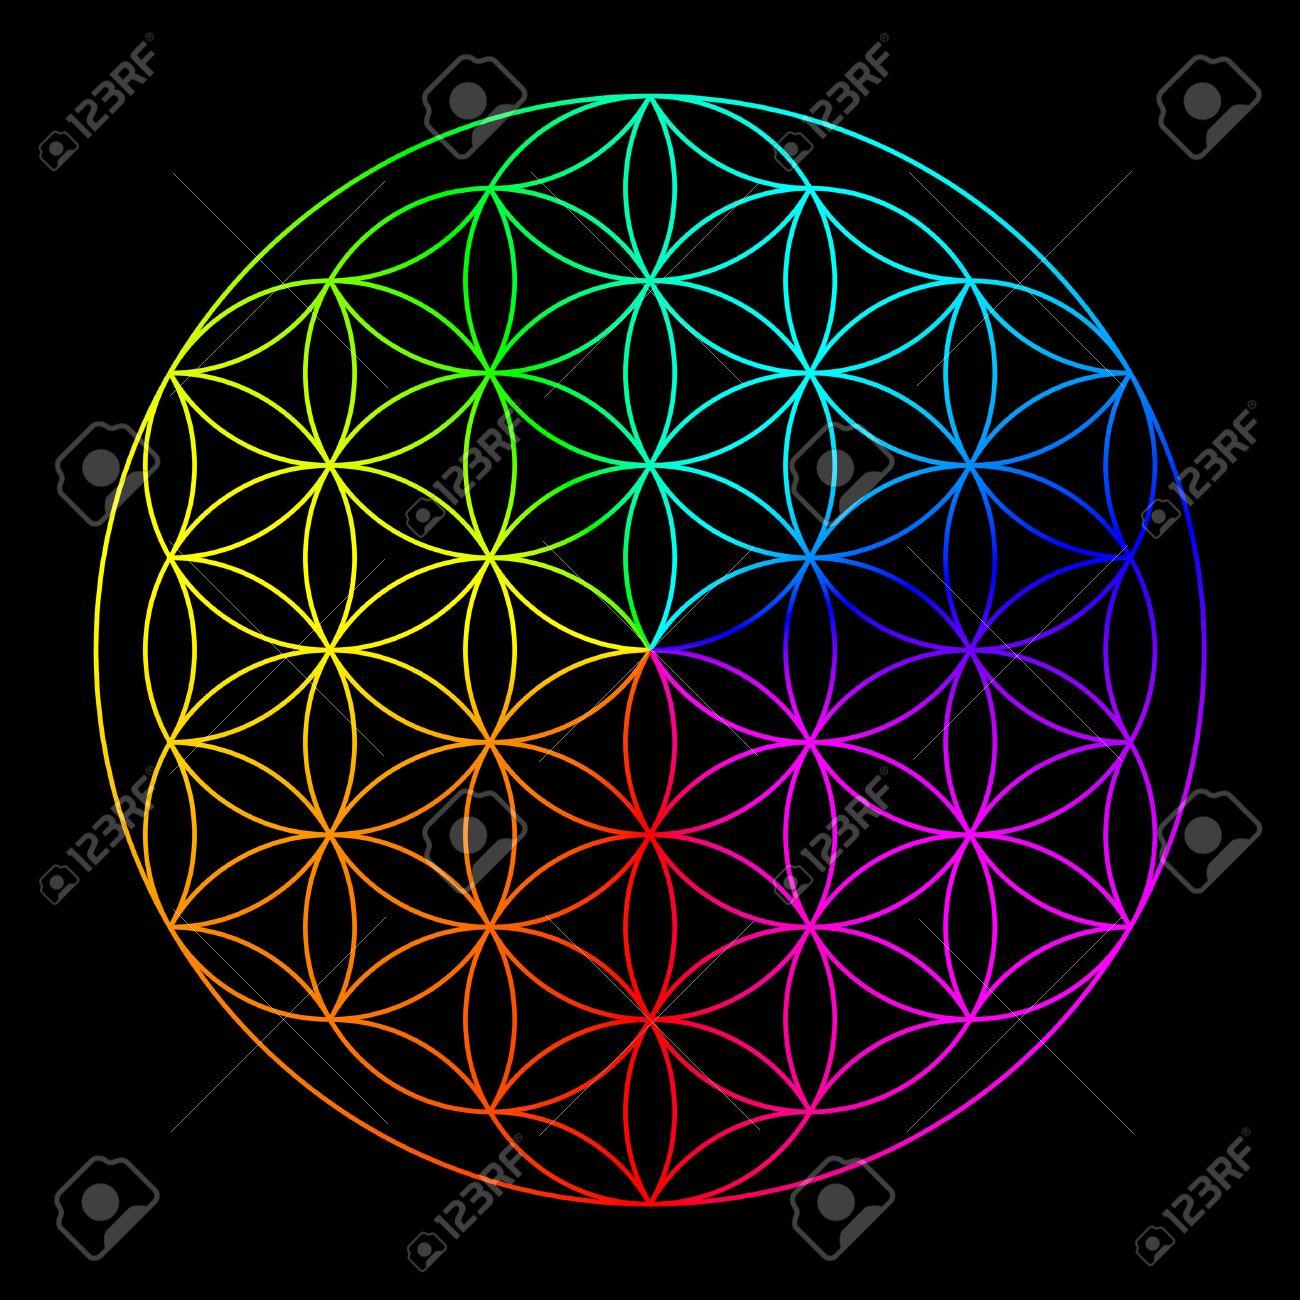 Arco Iris De La Flor De La Vida Símbolo De La Geometría Sagrada